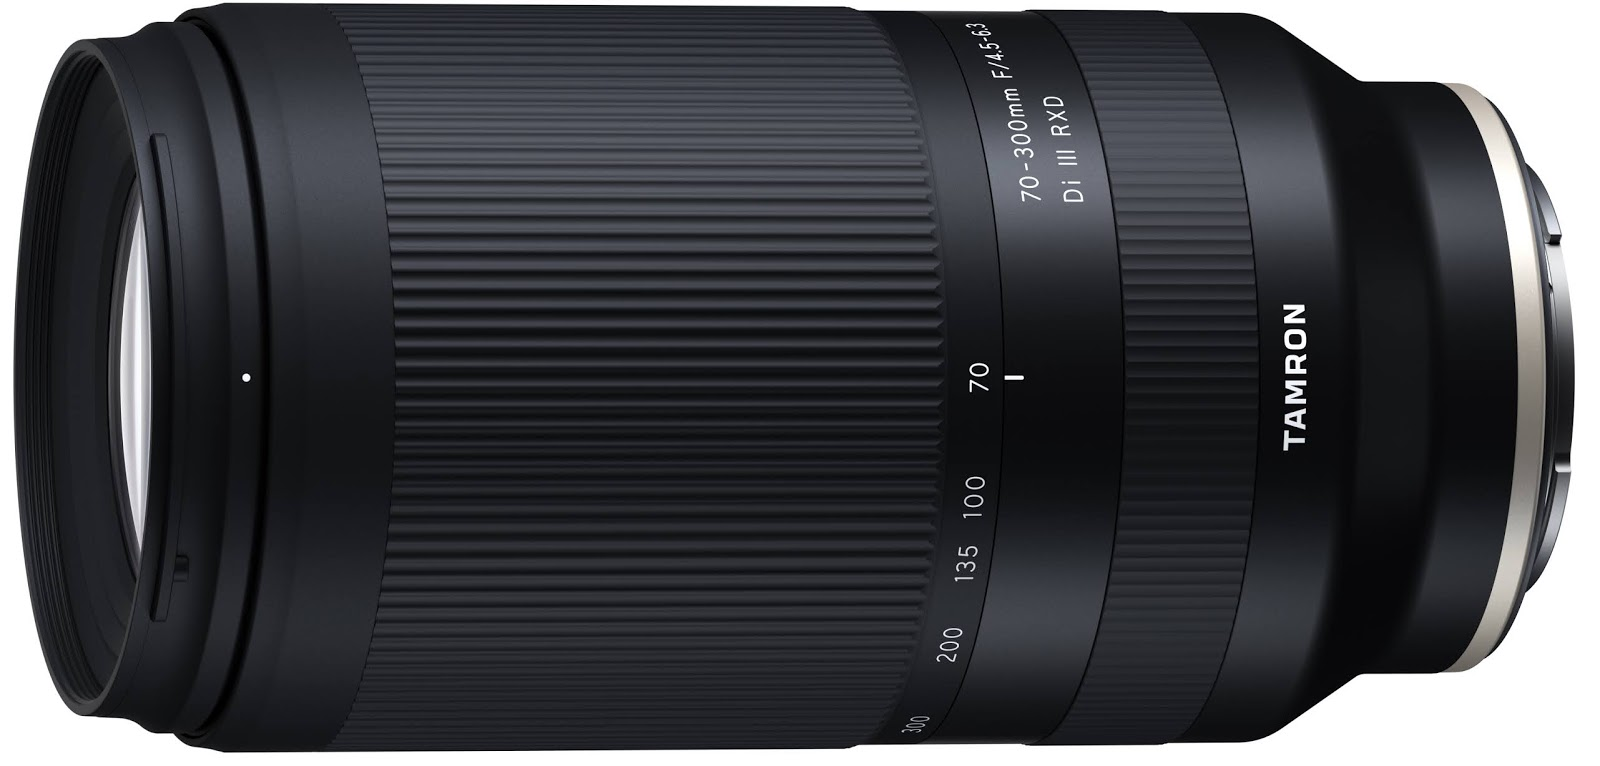 Объектив Tamron 70-300mm F/4.5-6.3 Di III RXD (A047)